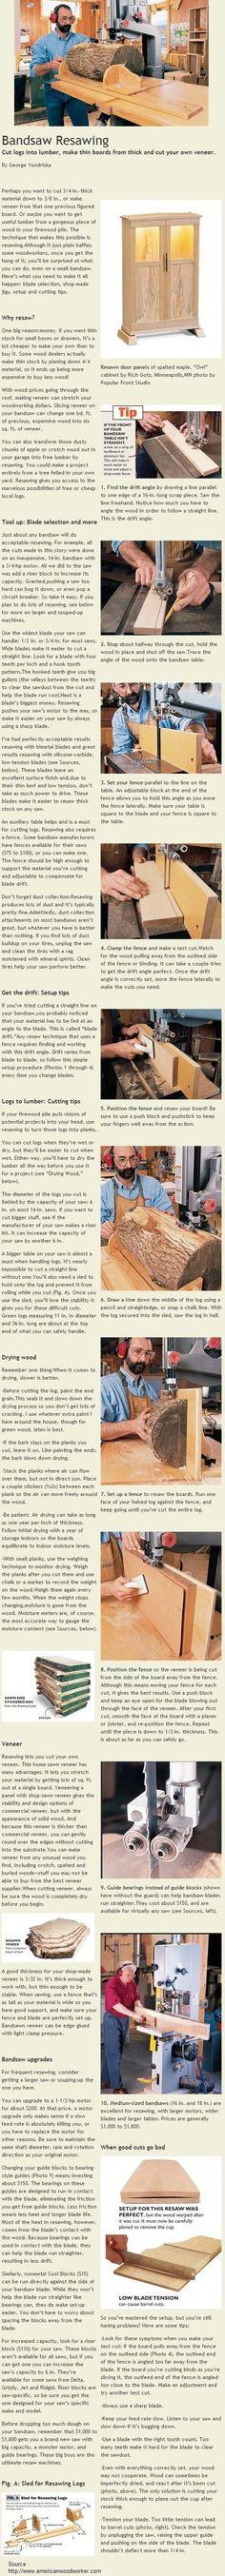 Bandsaw Resawing